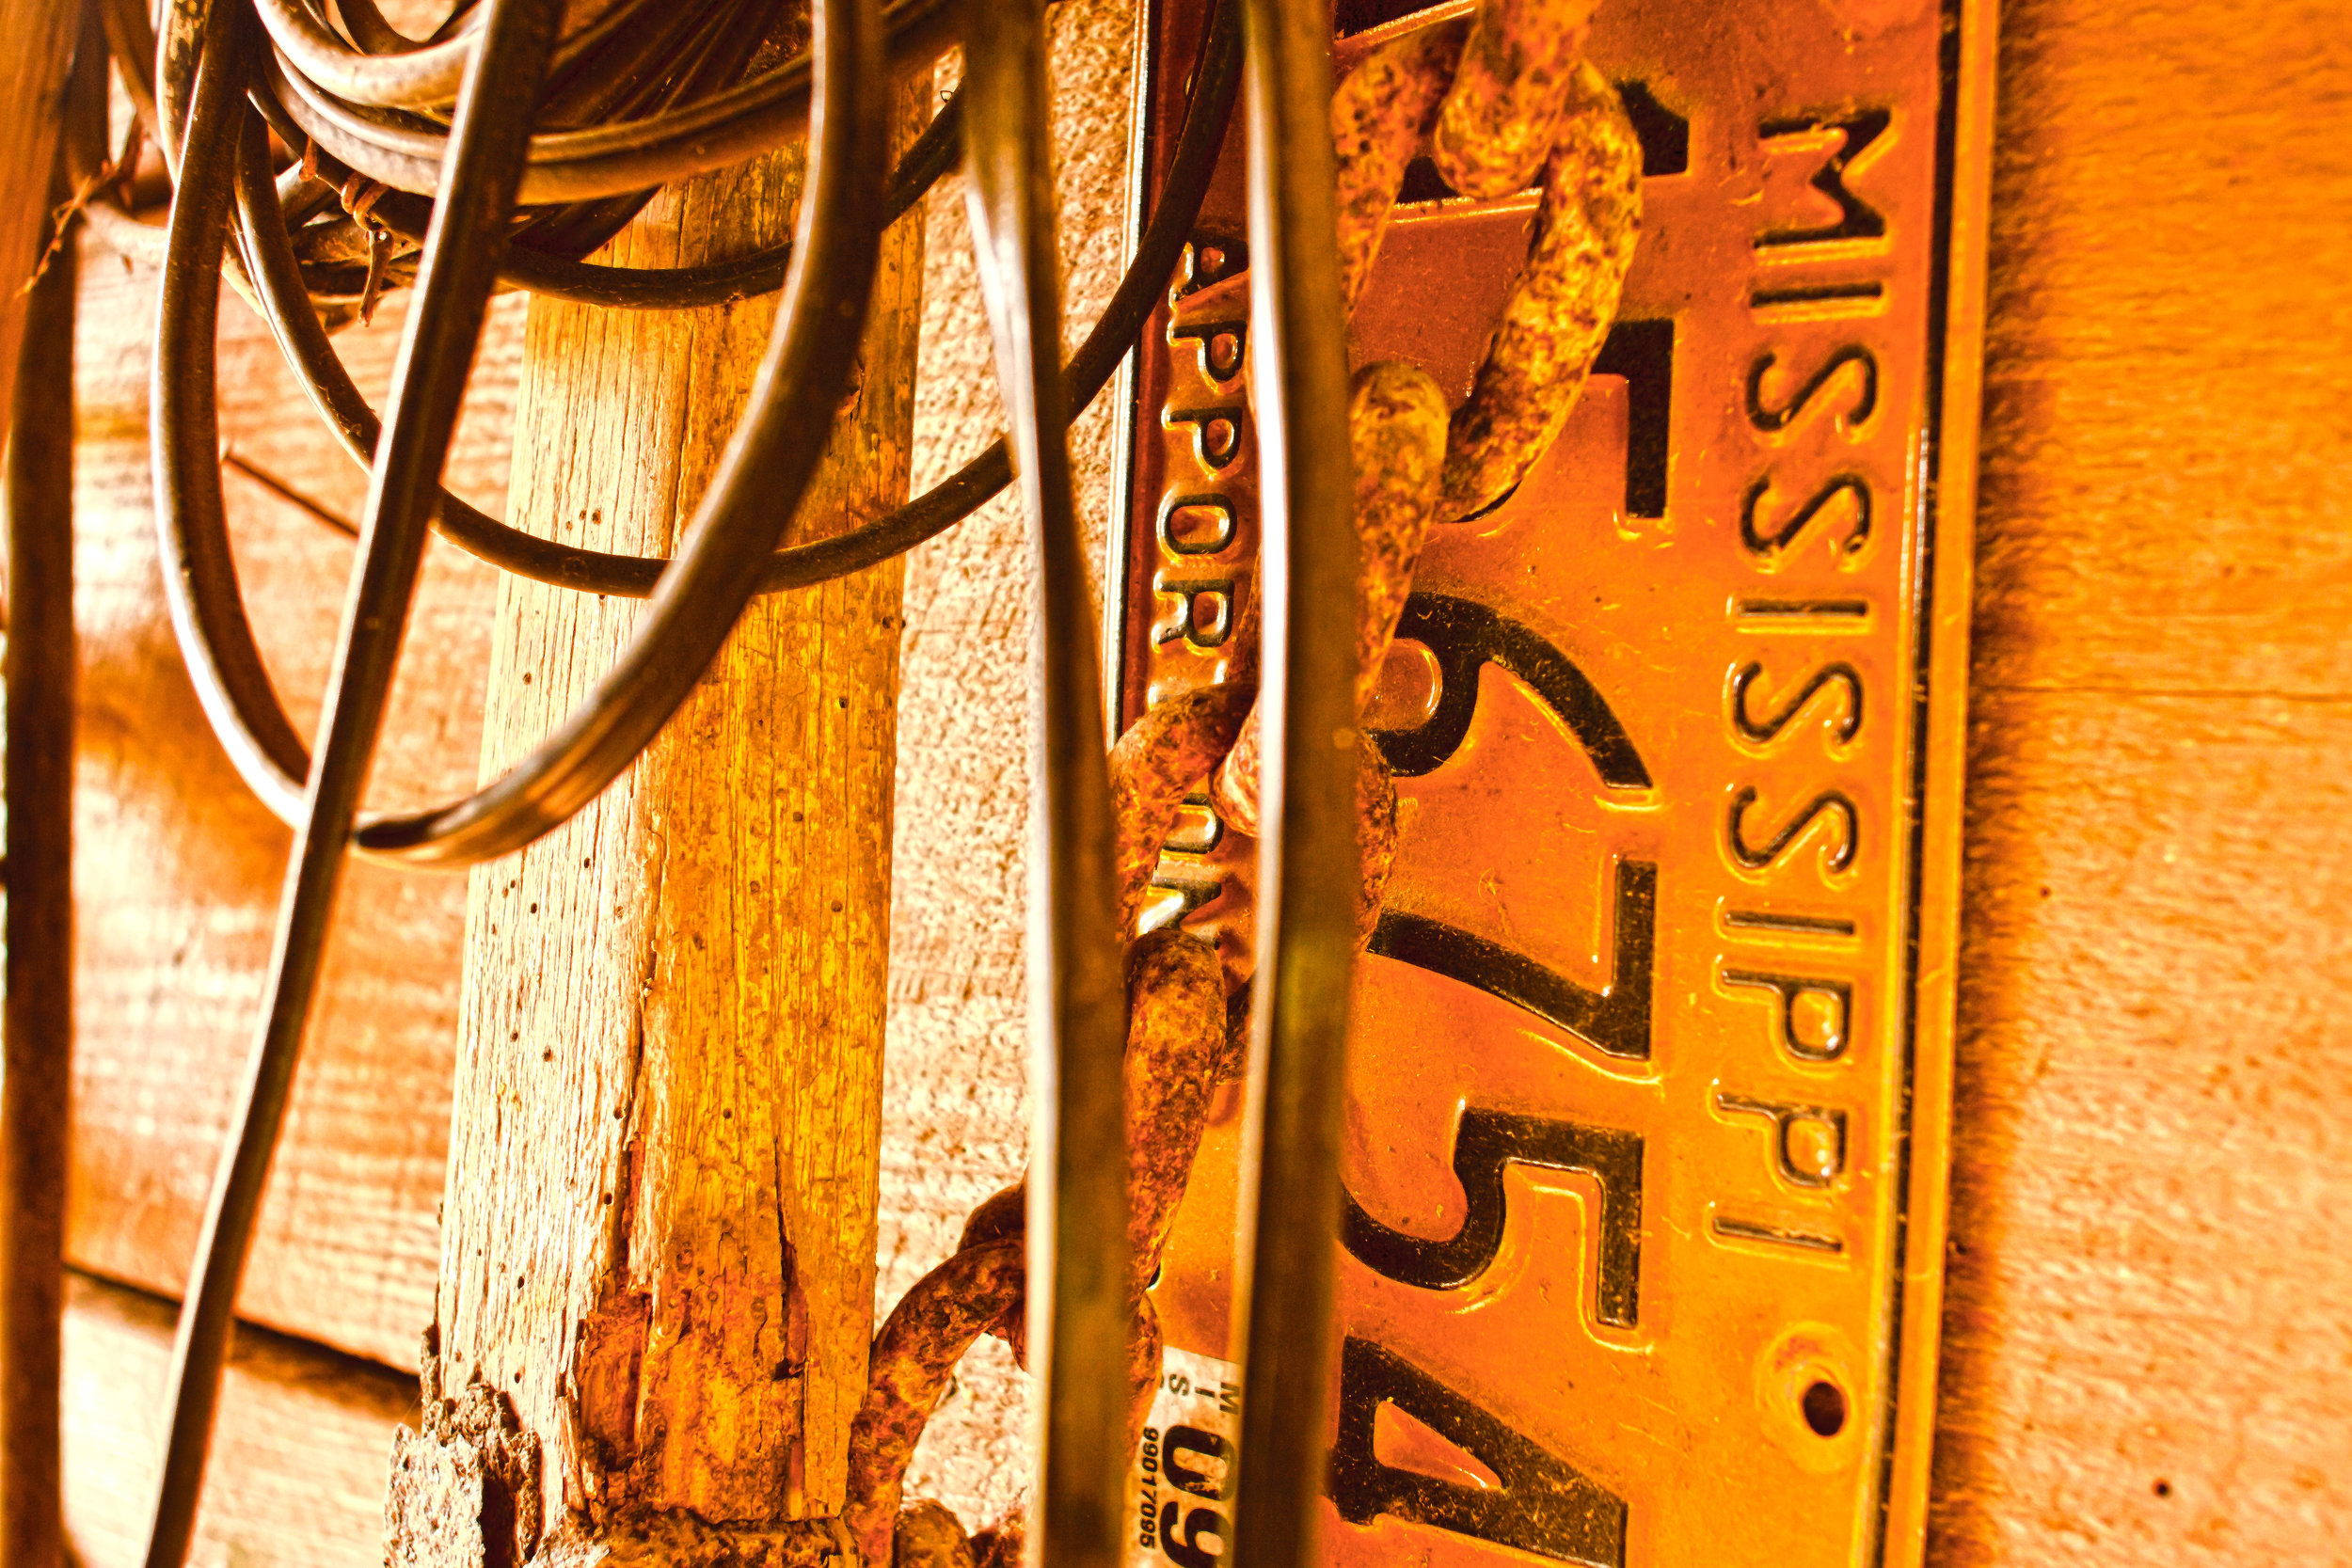 20110419-MississippiPlate.jpg